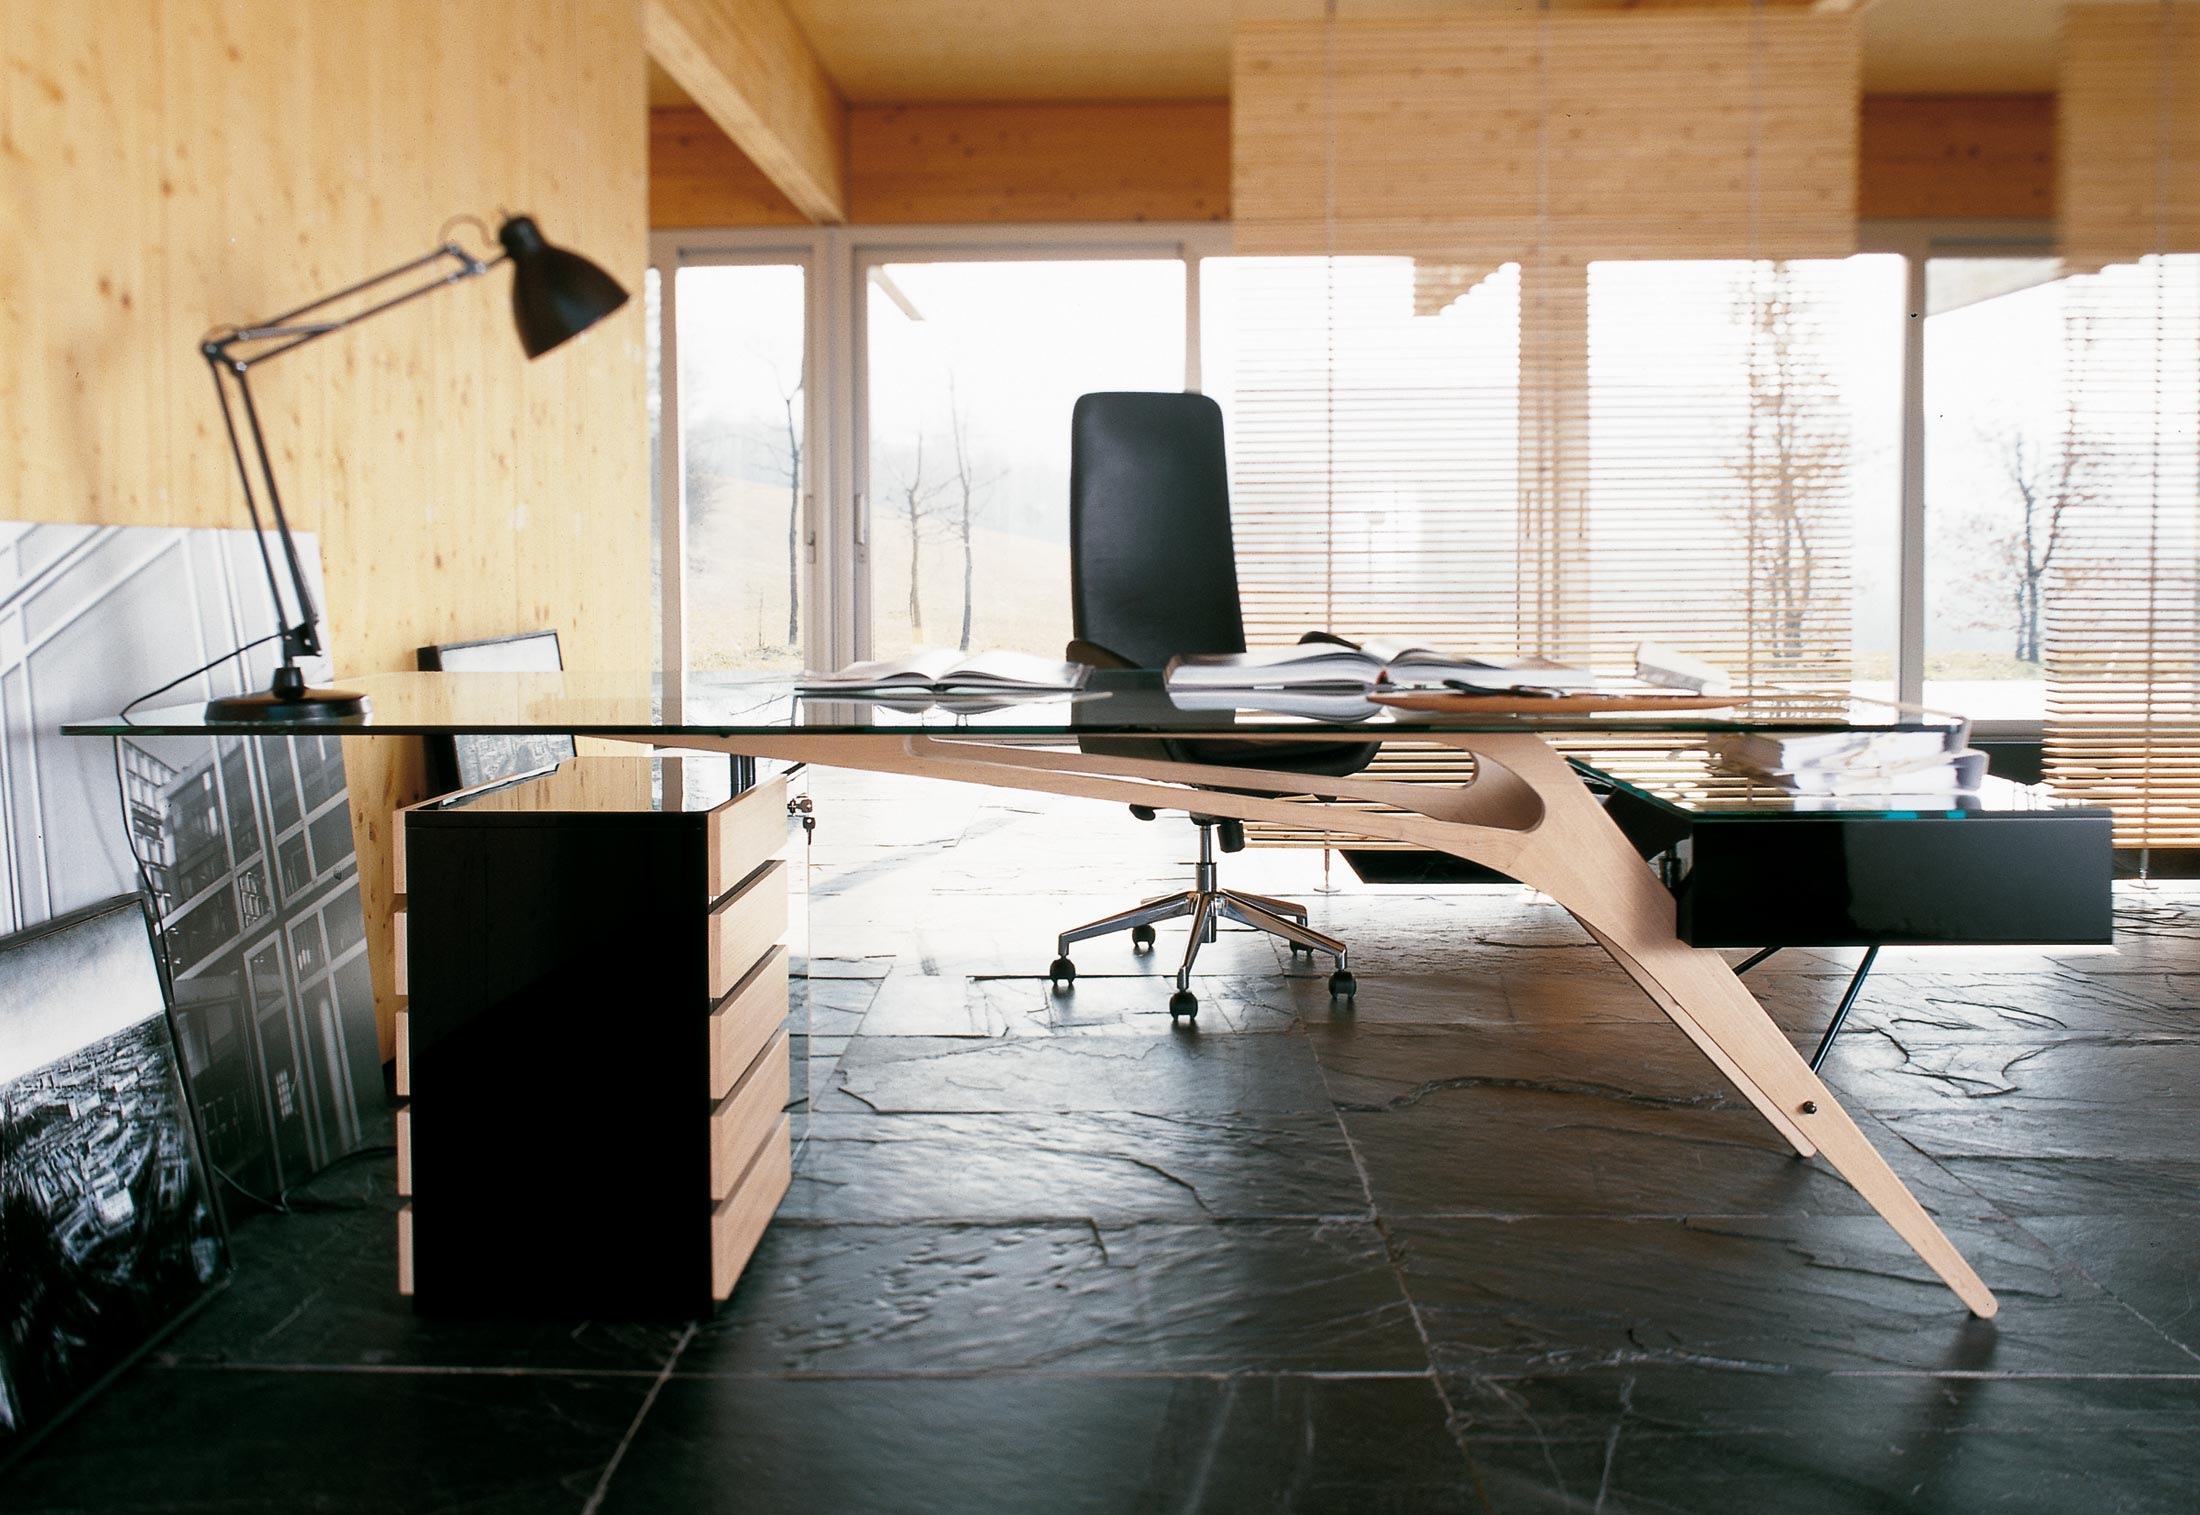 Best Kitchen Gallery: Designer Desk Interior Design Ideas of Designer Desks For Home  on rachelxblog.com